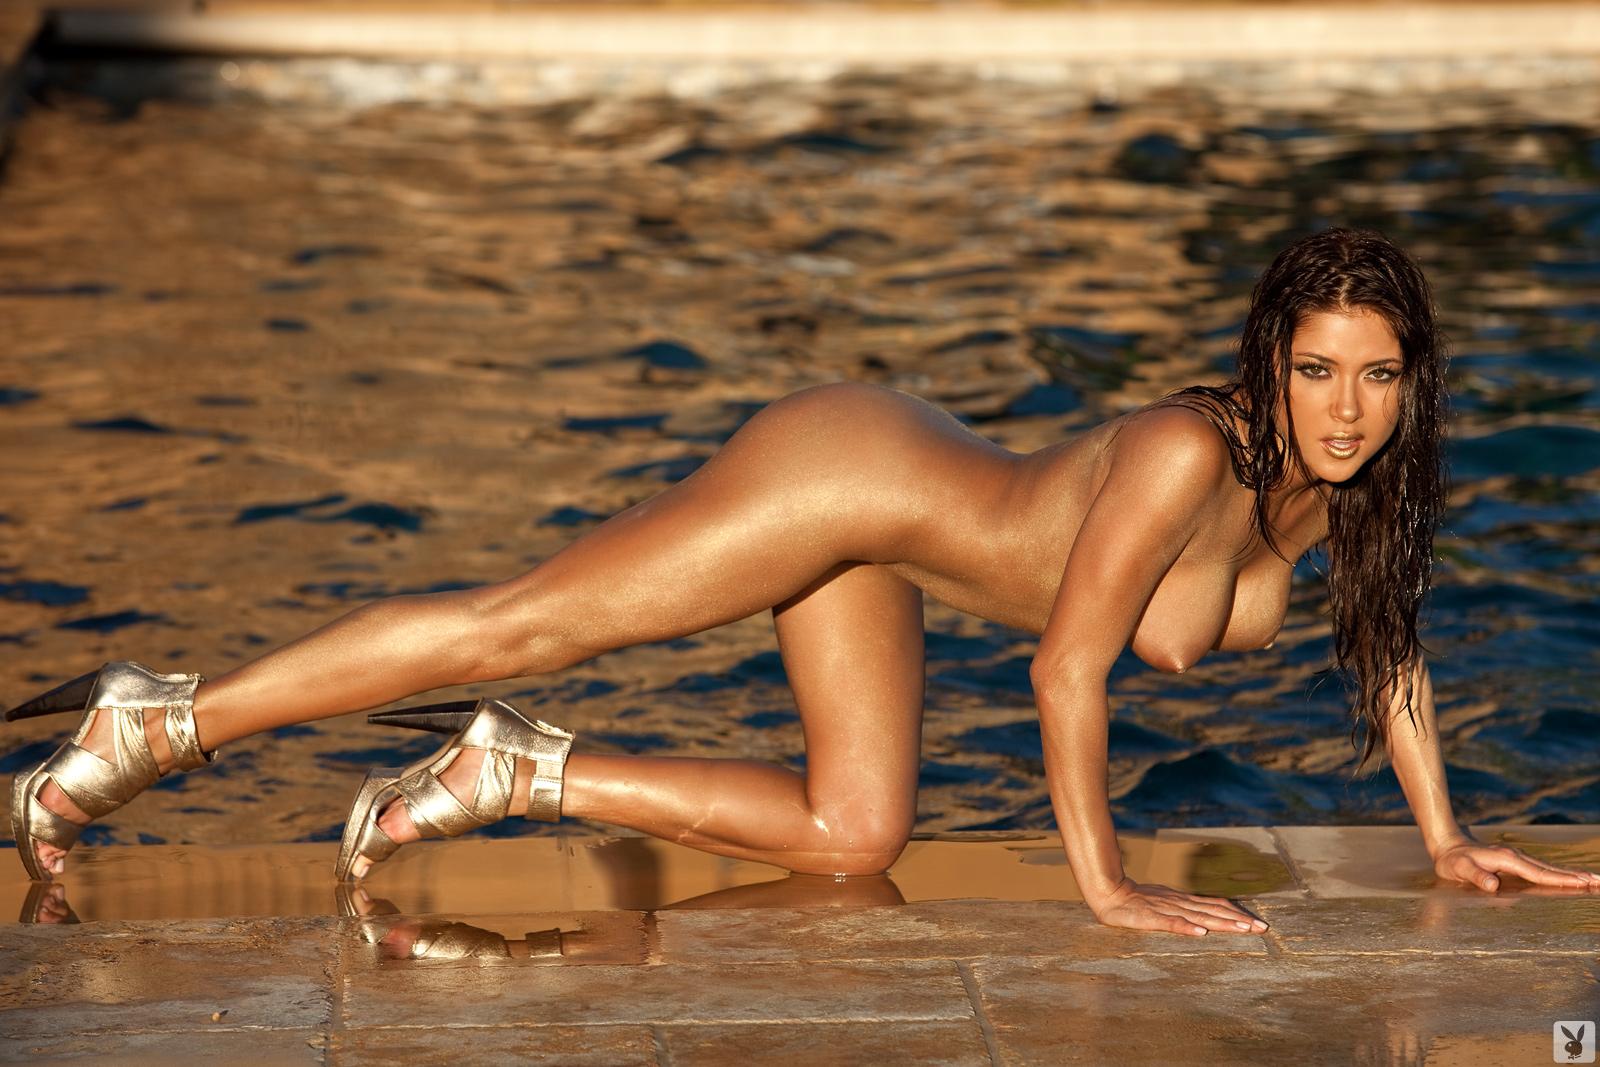 http://2.bp.blogspot.com/-Mlj9Mvcdrps/Ta0ol7Hd1oI/AAAAAAAAC-8/sxbrAsPhWvg/s1600/arianny+celeste+playboy+nude+pics+november+2010+%252816%2529.jpg